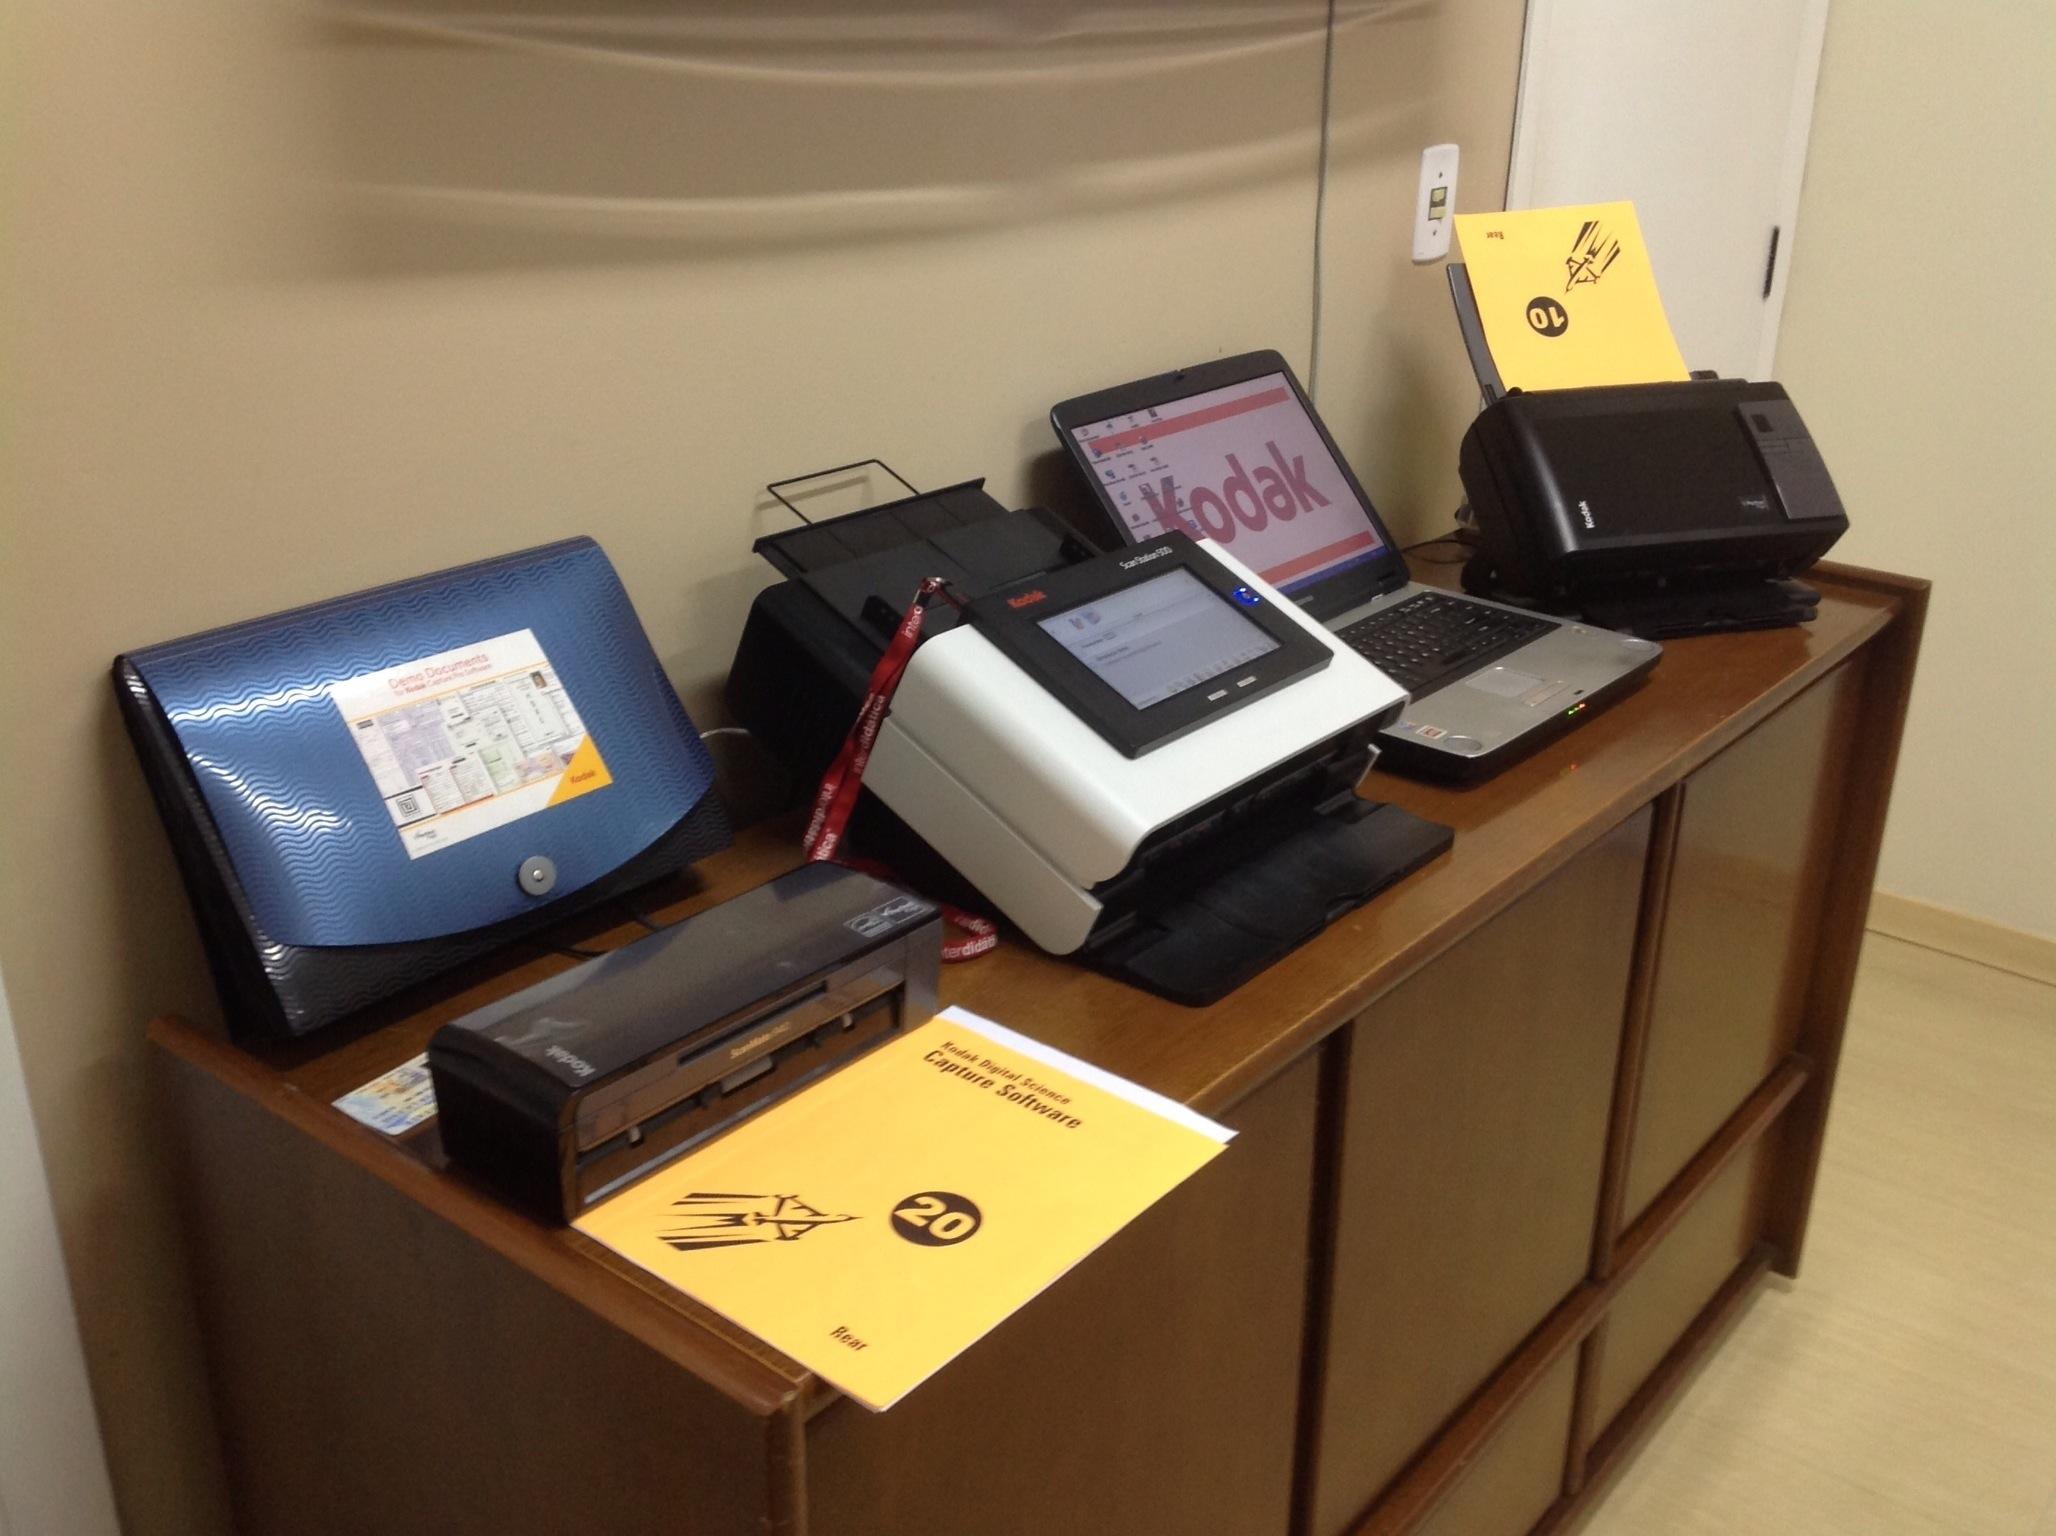 Modelos de scanners avaliados na Netscan